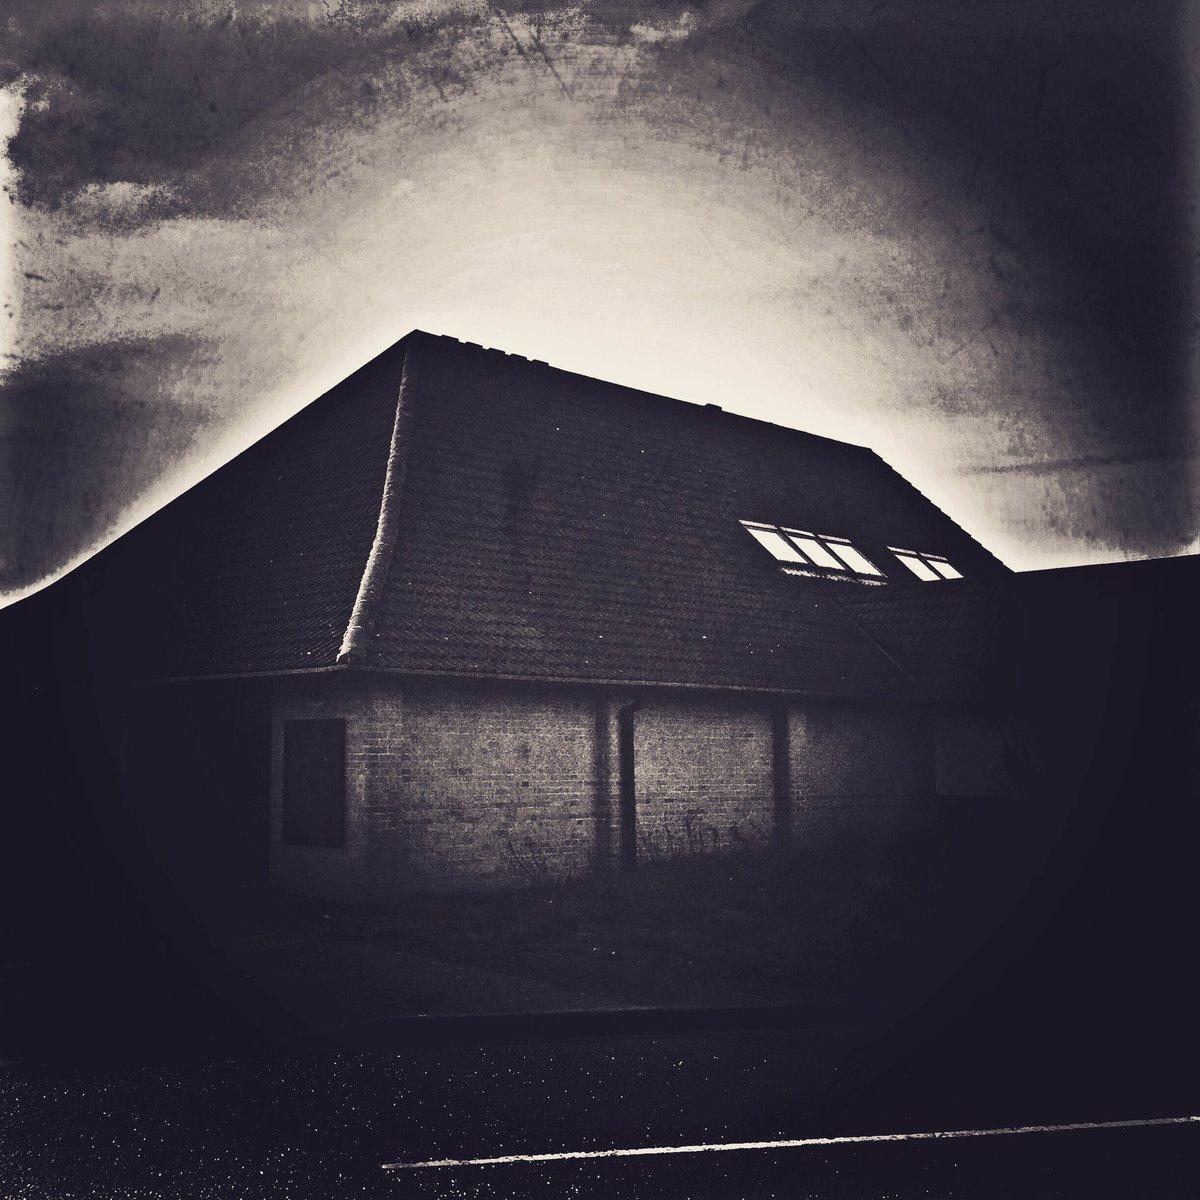 #blackandwhitephotography #blackandwhite #Building